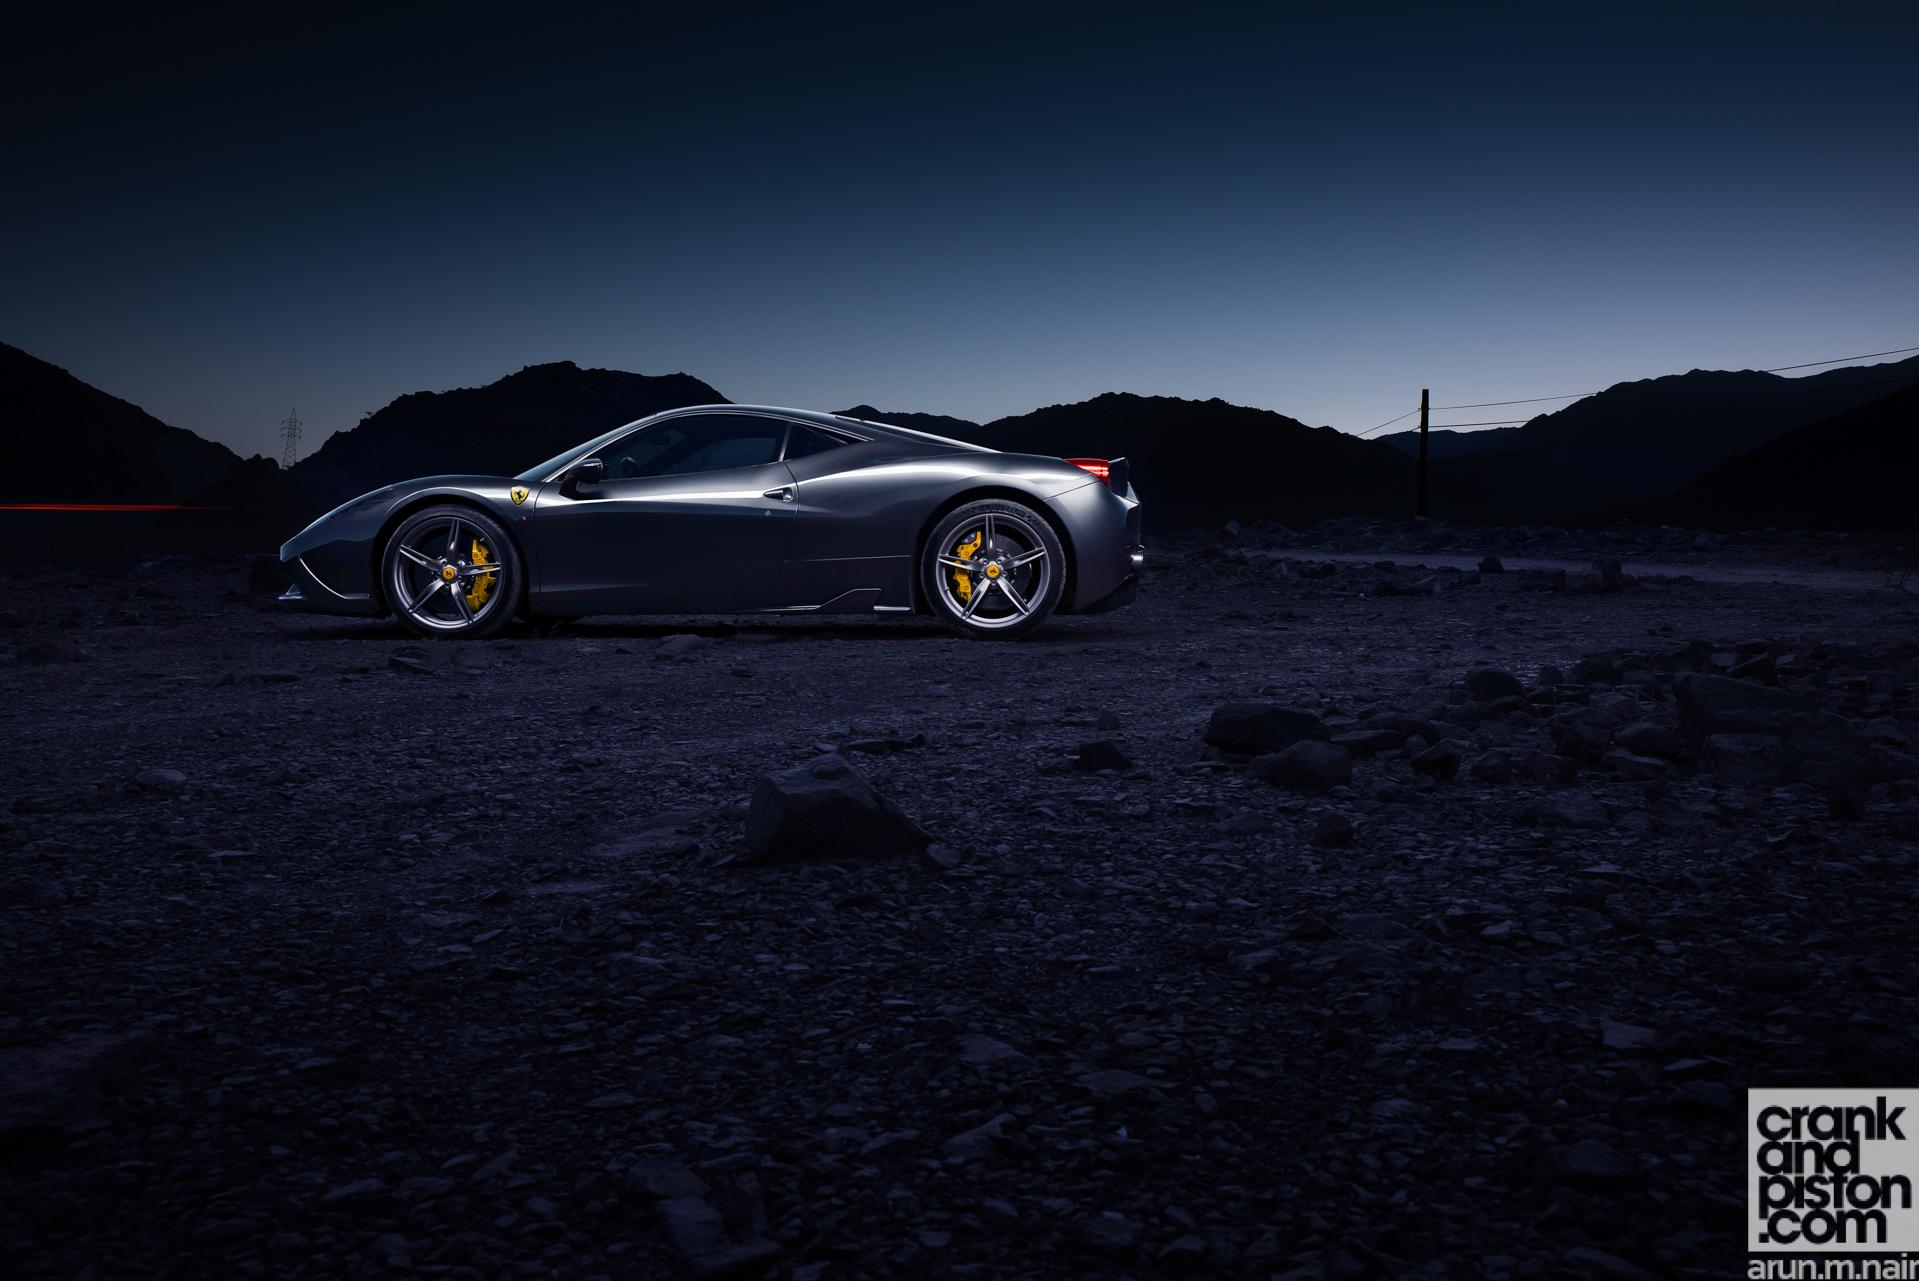 Ferrari 458 Speciale Wallpapers-06